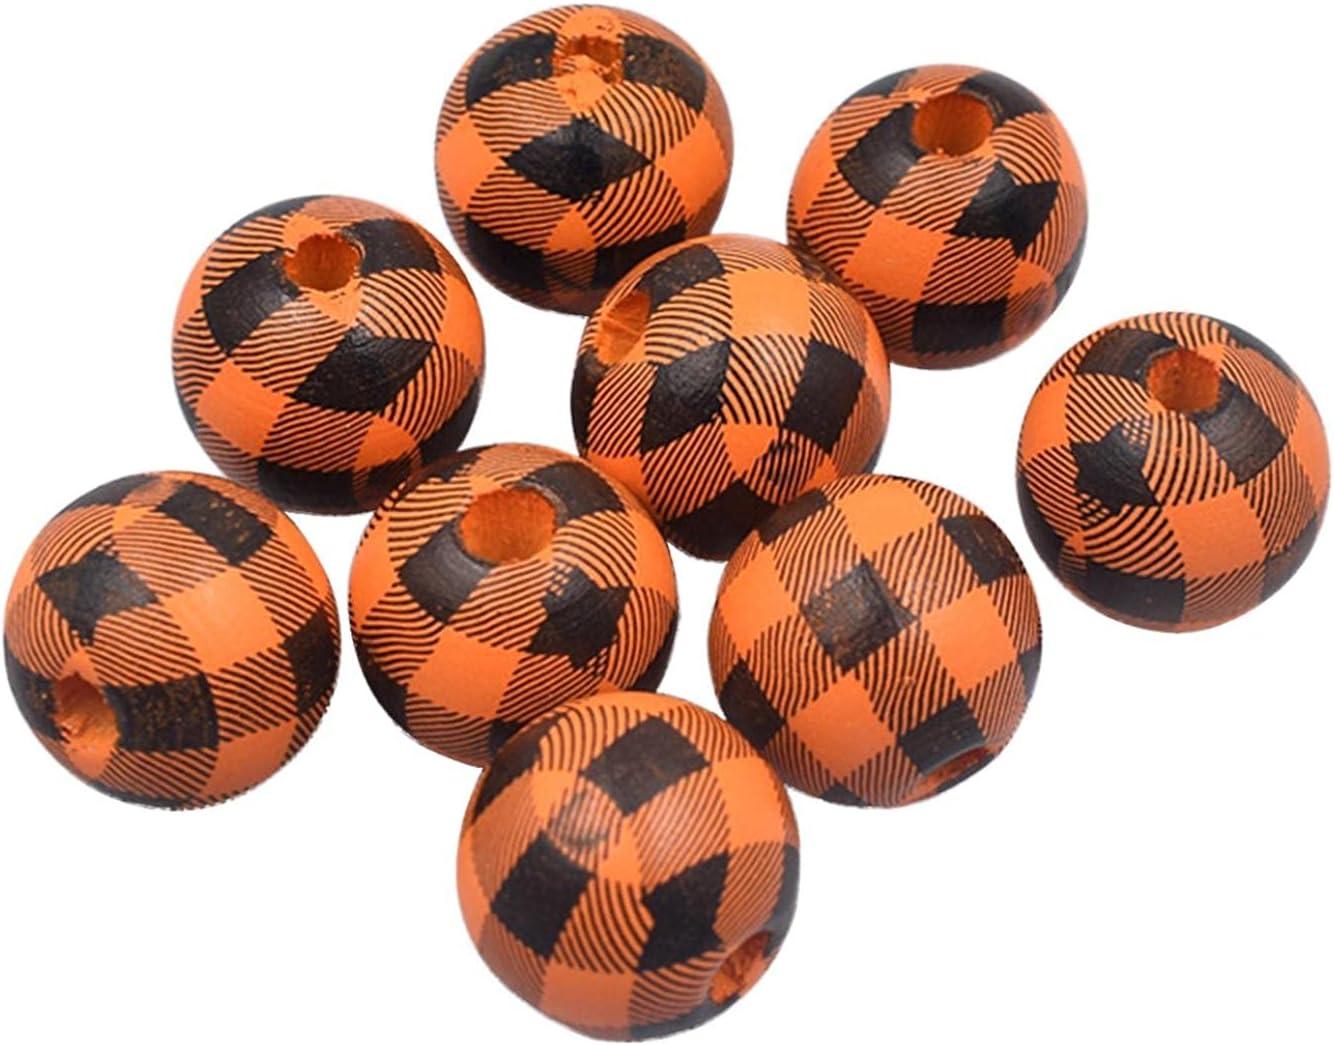 Popular standard 50PC Plaid Wood Beads Print DIY Garlan Rustic Wooden Max 52% OFF